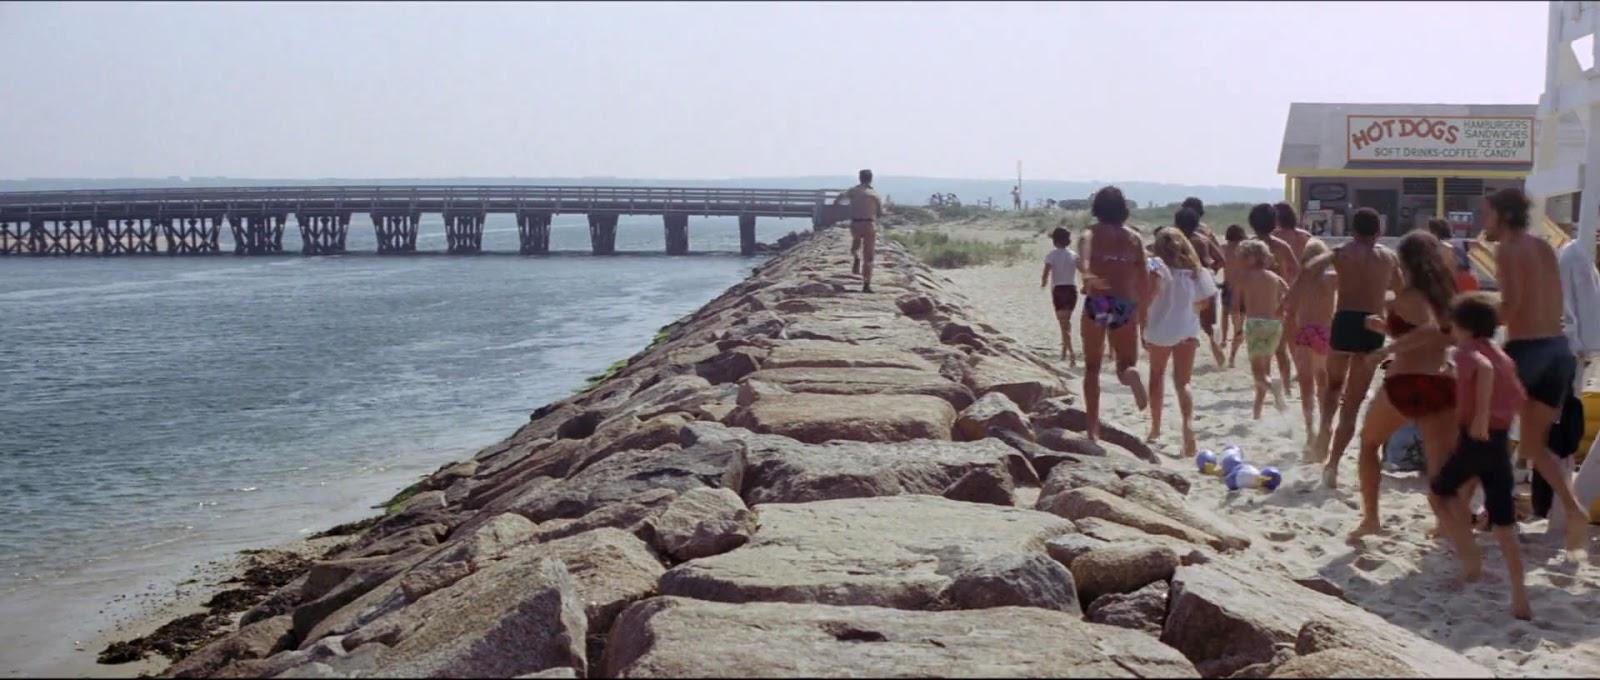 Image result for jaws ellen running over bridge